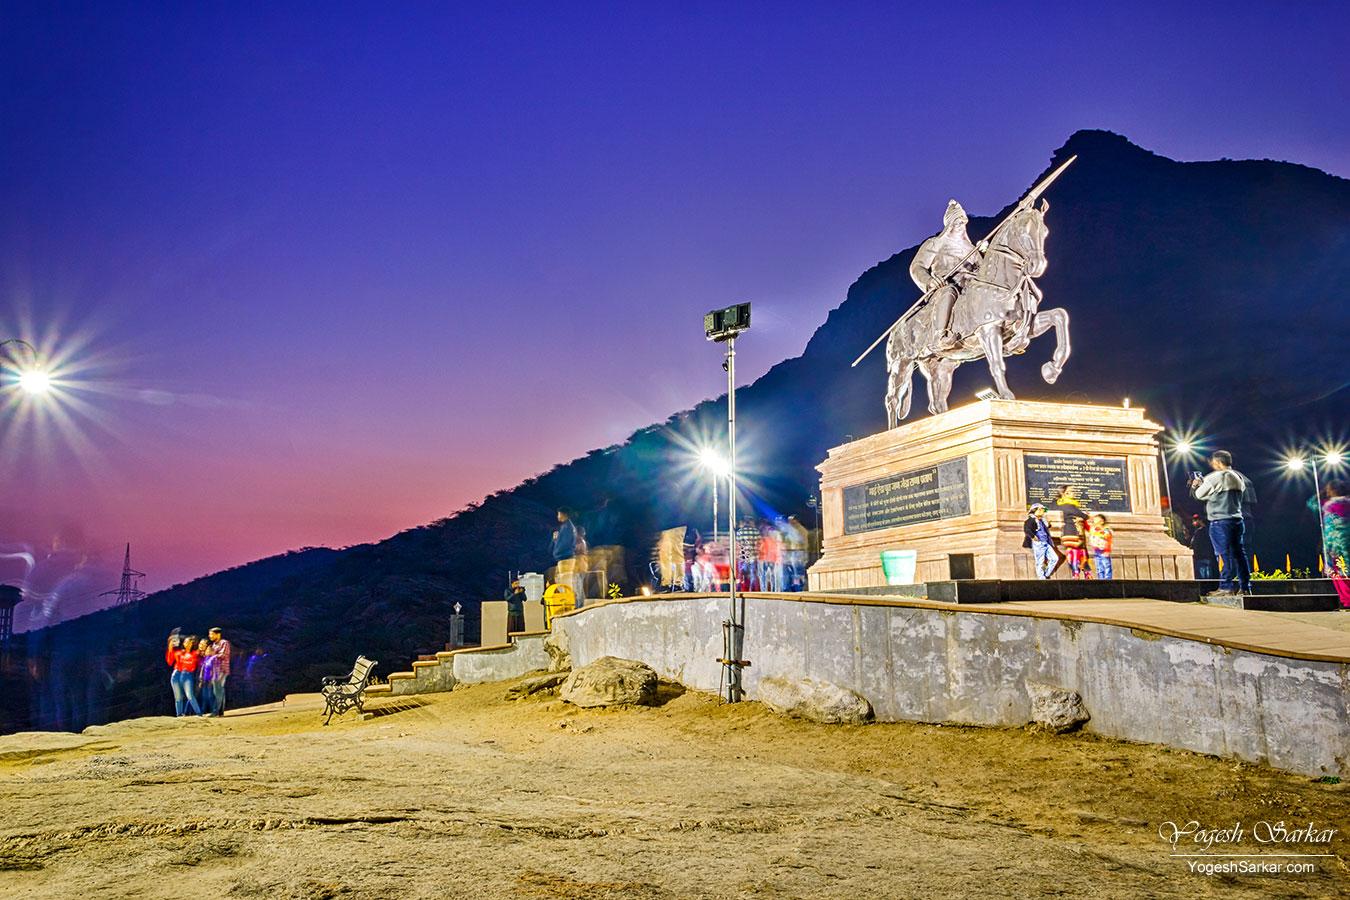 27-maharana-pratap-statue-at-night.jpg